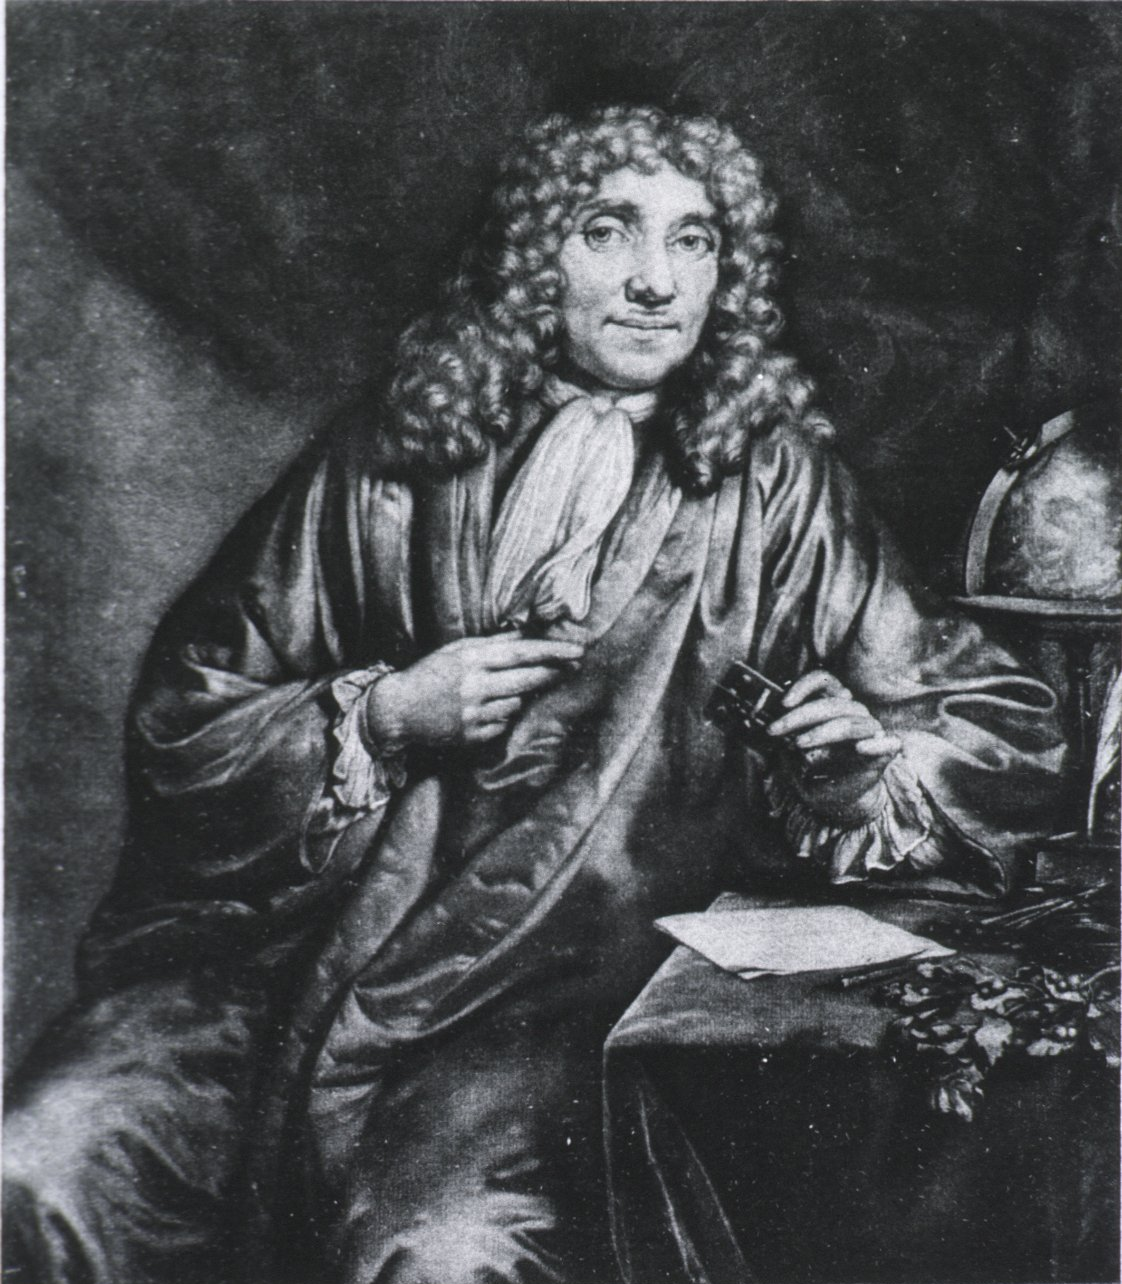 File:Anton van Leeuwenhoek.png - Wikimedia Commons